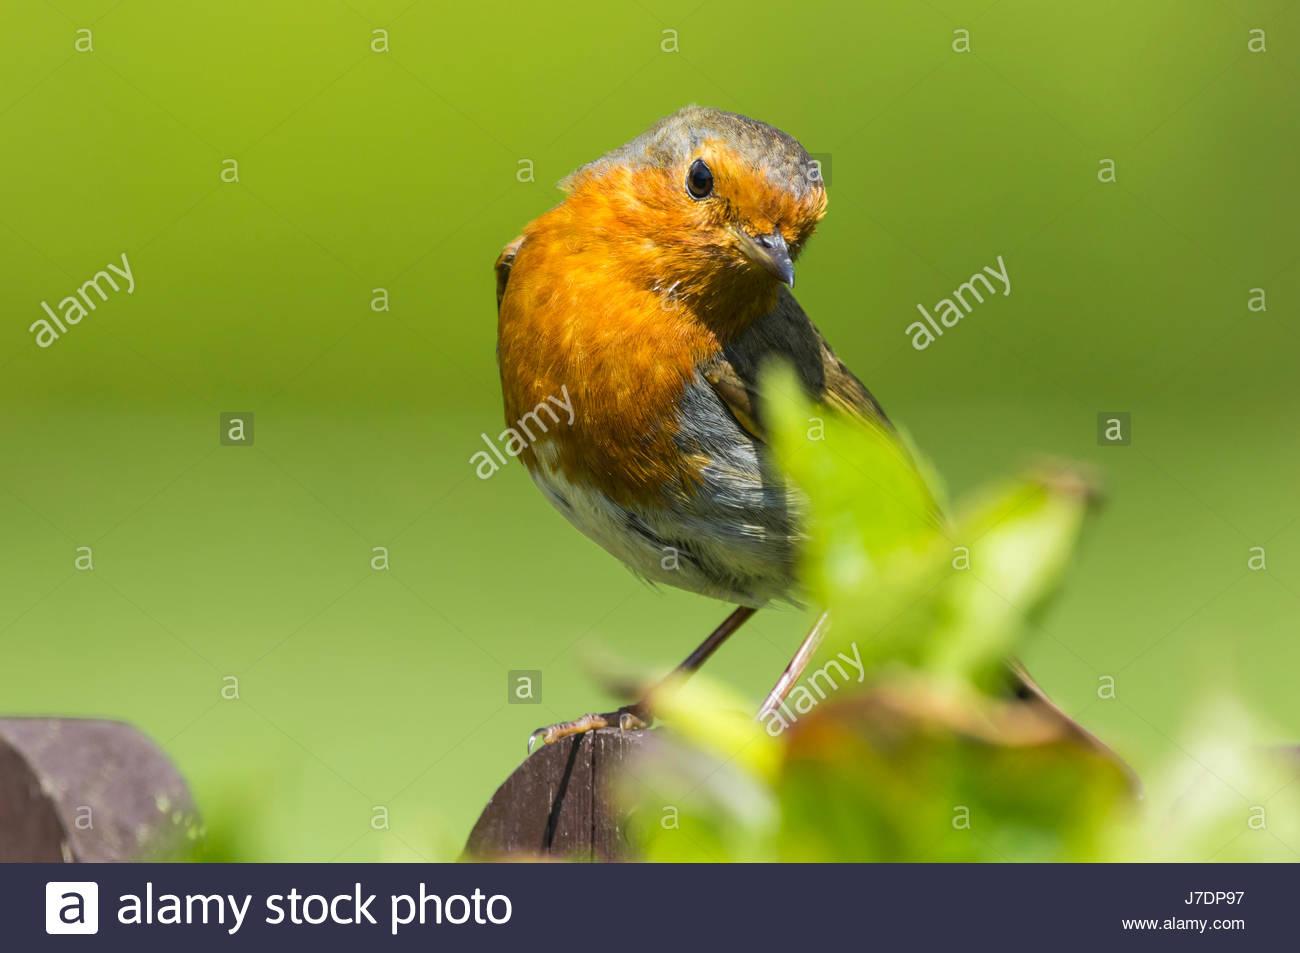 erithacus-rubecula-adult-european-robin-